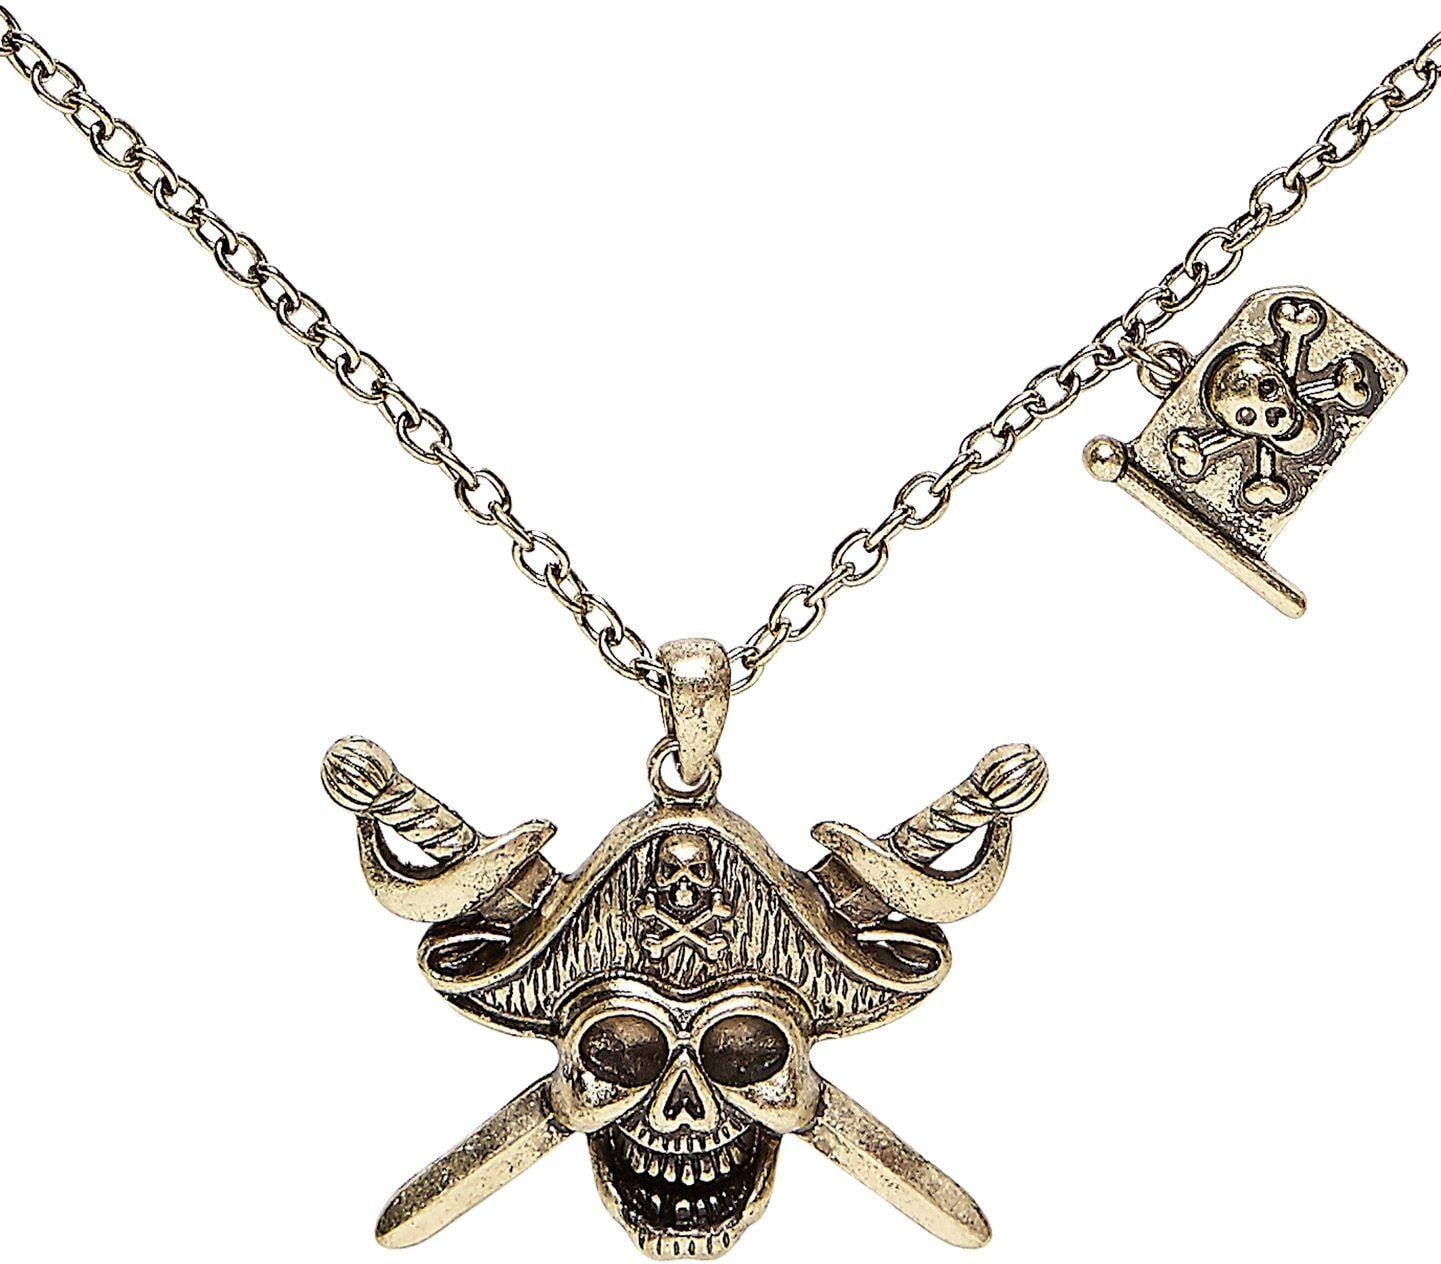 Piraten doodshoofd ketting